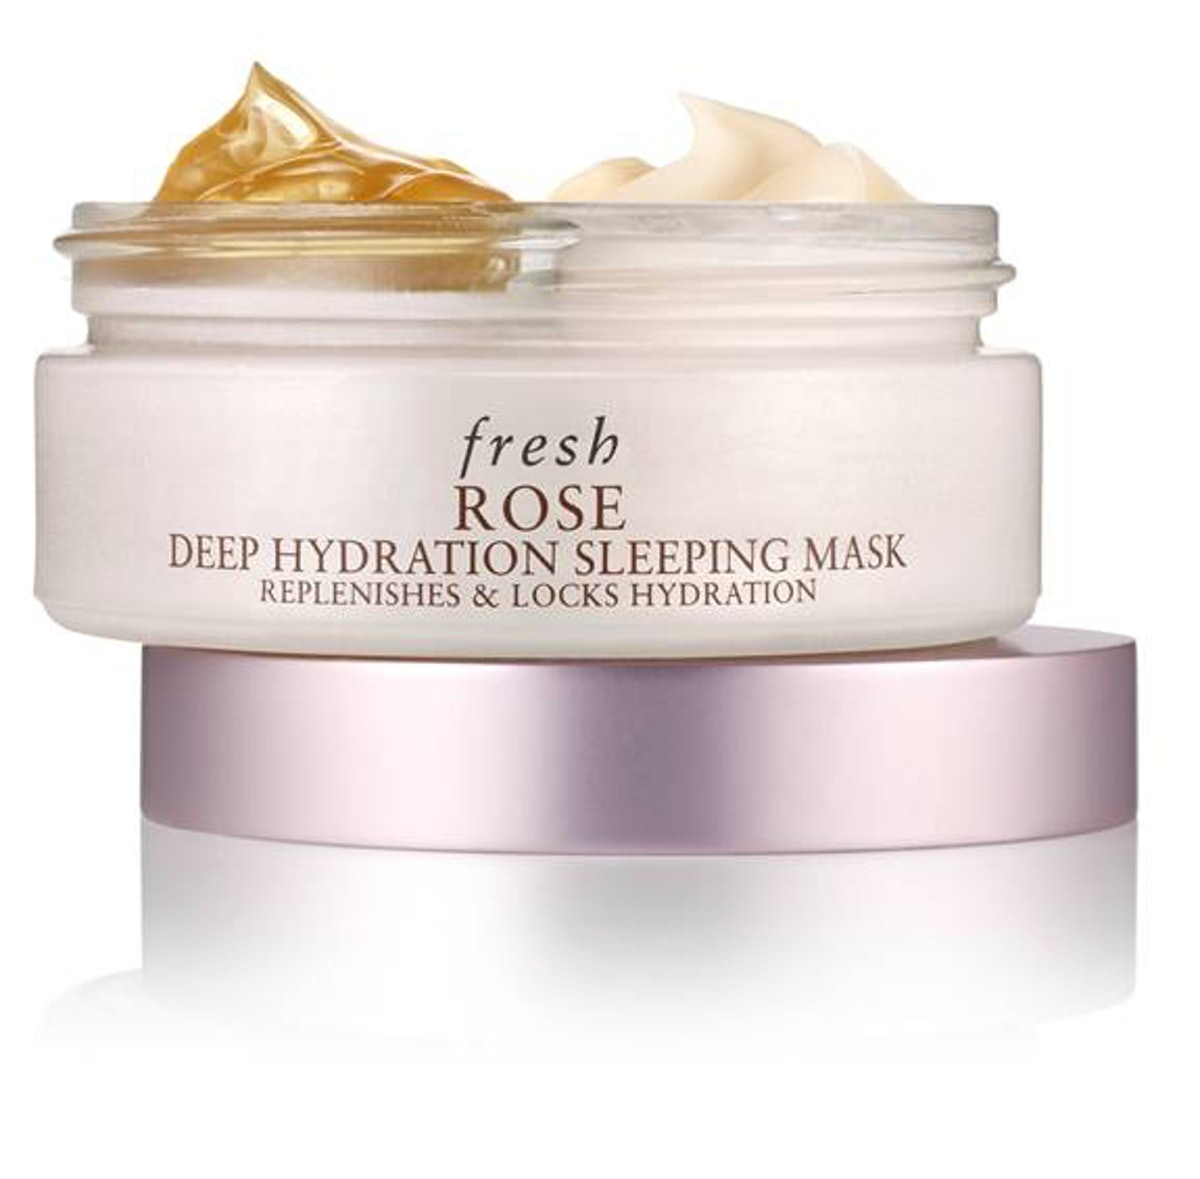 Rose Deep Hydration Sleeping Mask